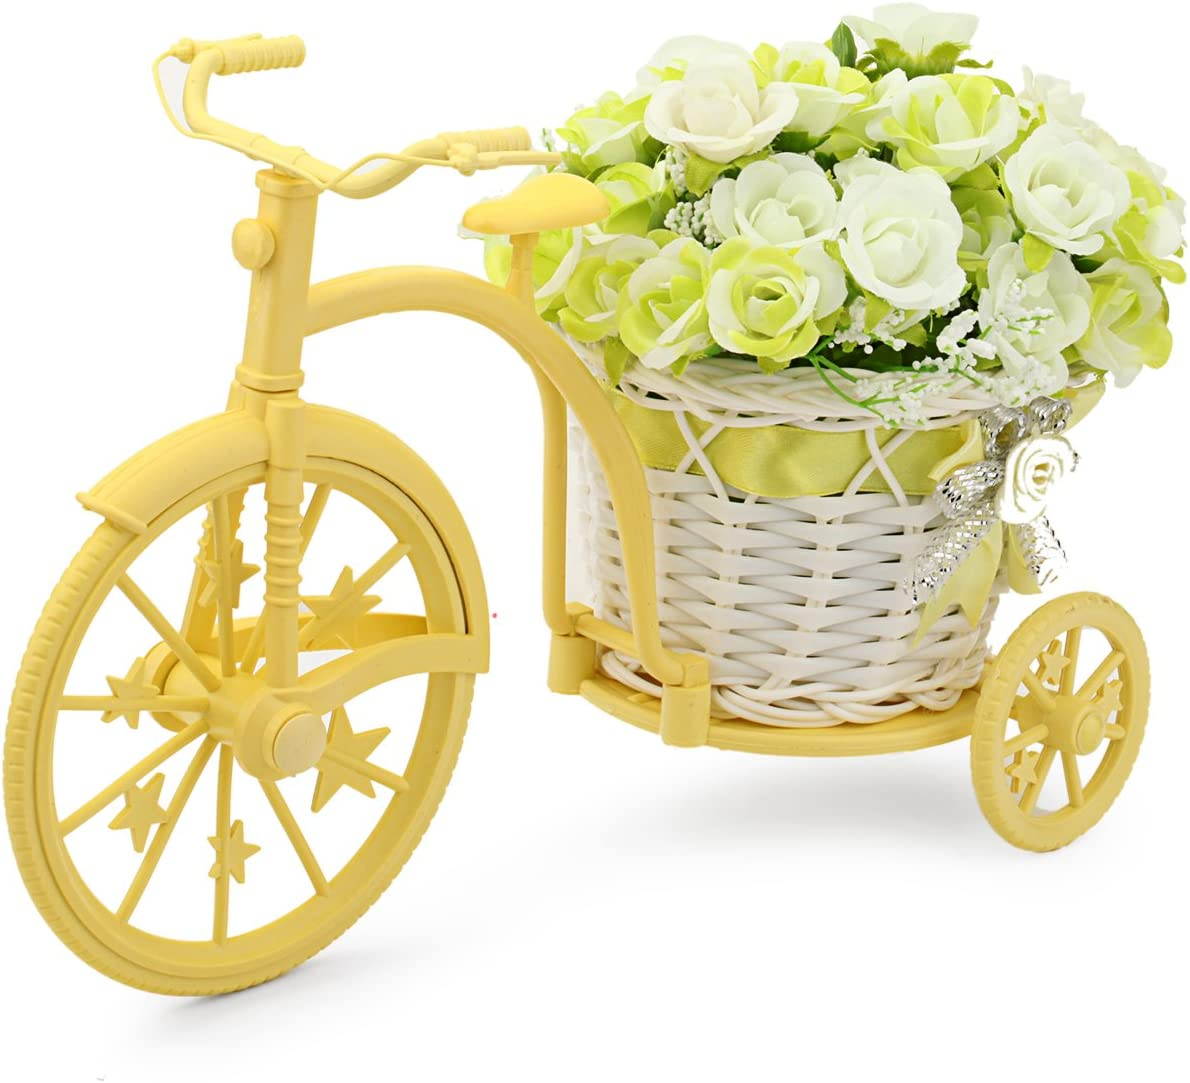 Louis Garden Nostalgic Bicycle Artificial Flower Decor Plant Stand (Green)